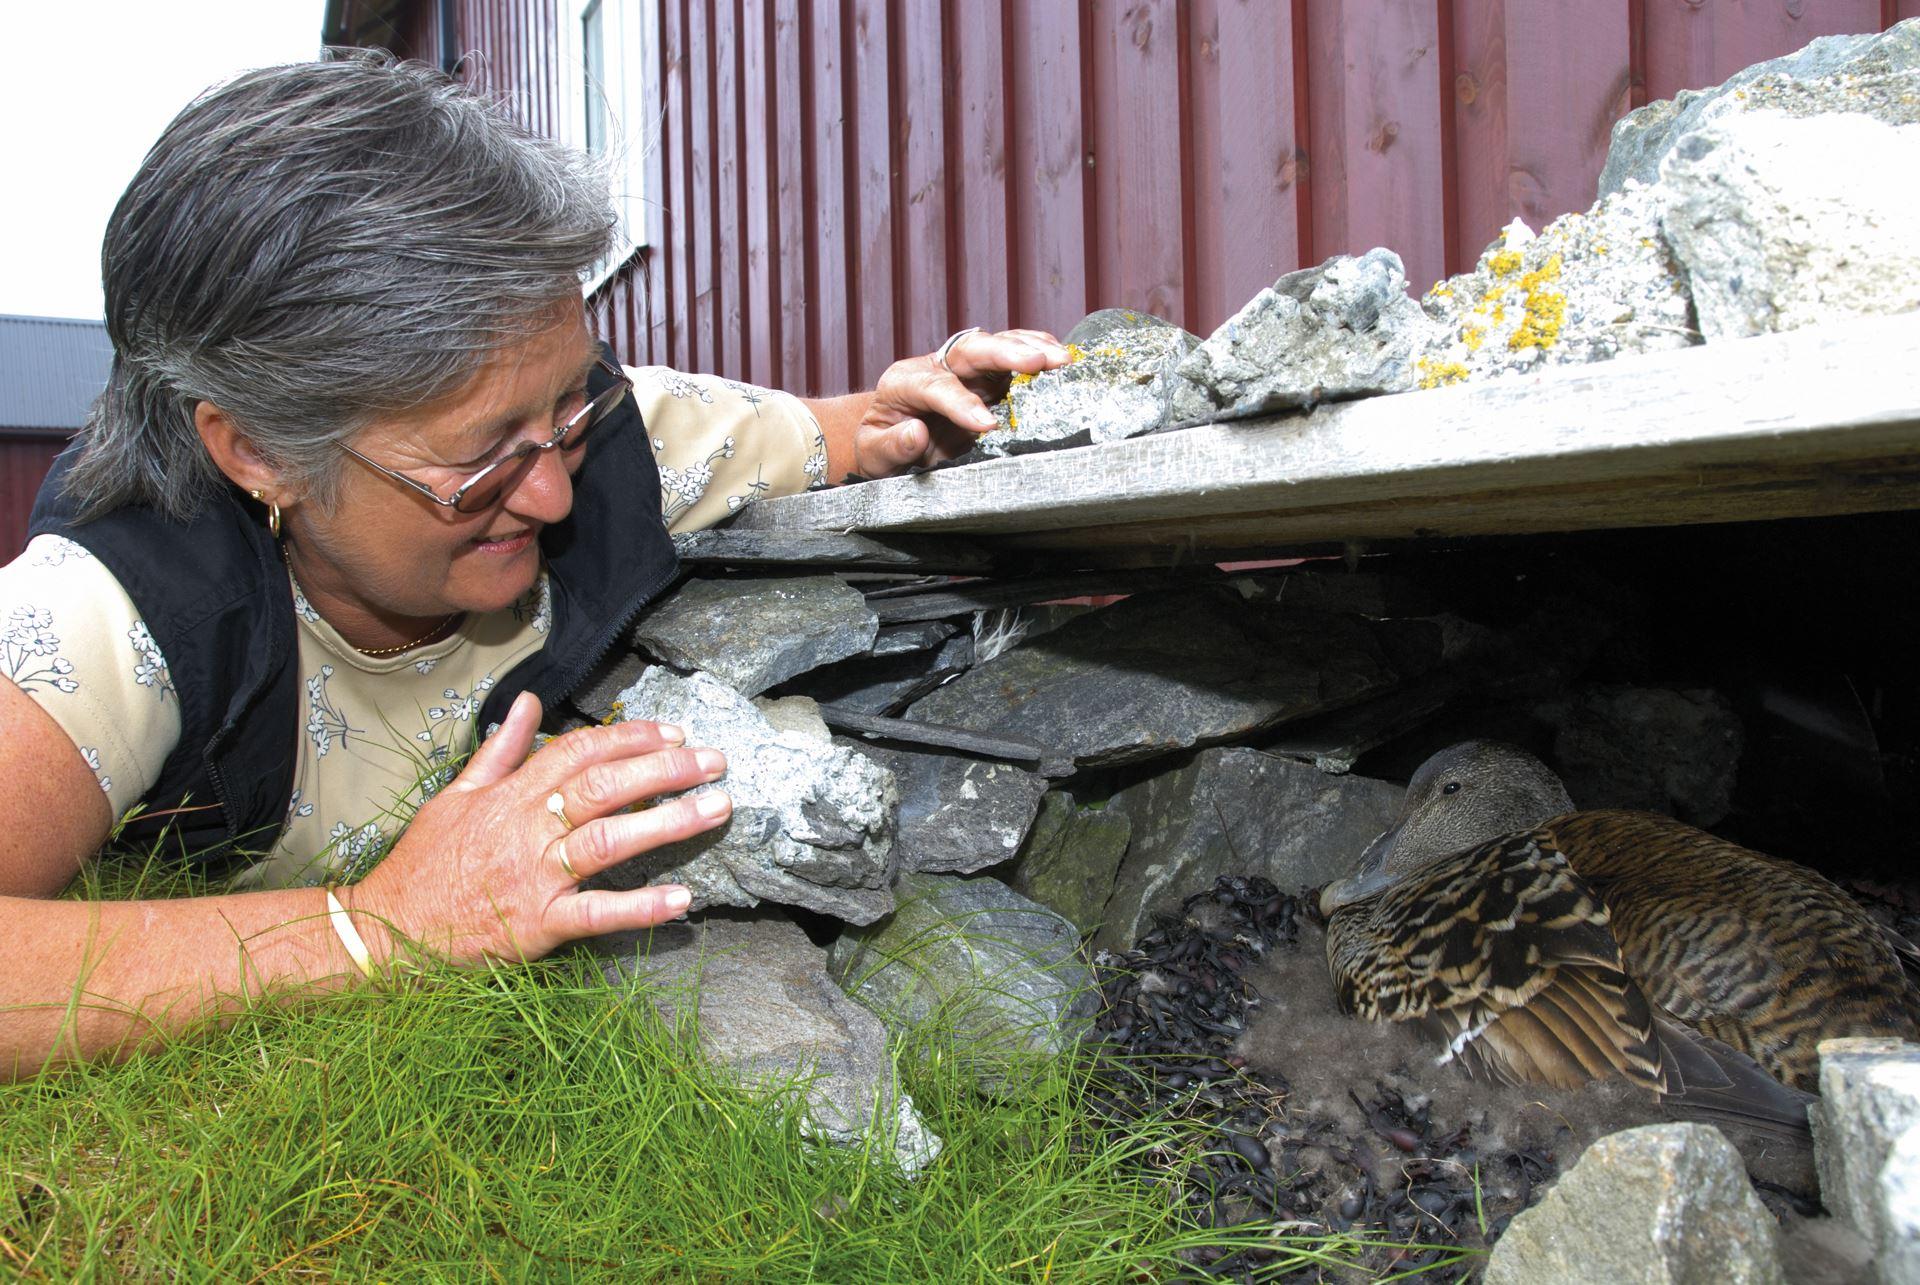 www.lanan.no,  © Utværet Lånan, Fuglevokter sjekker reir